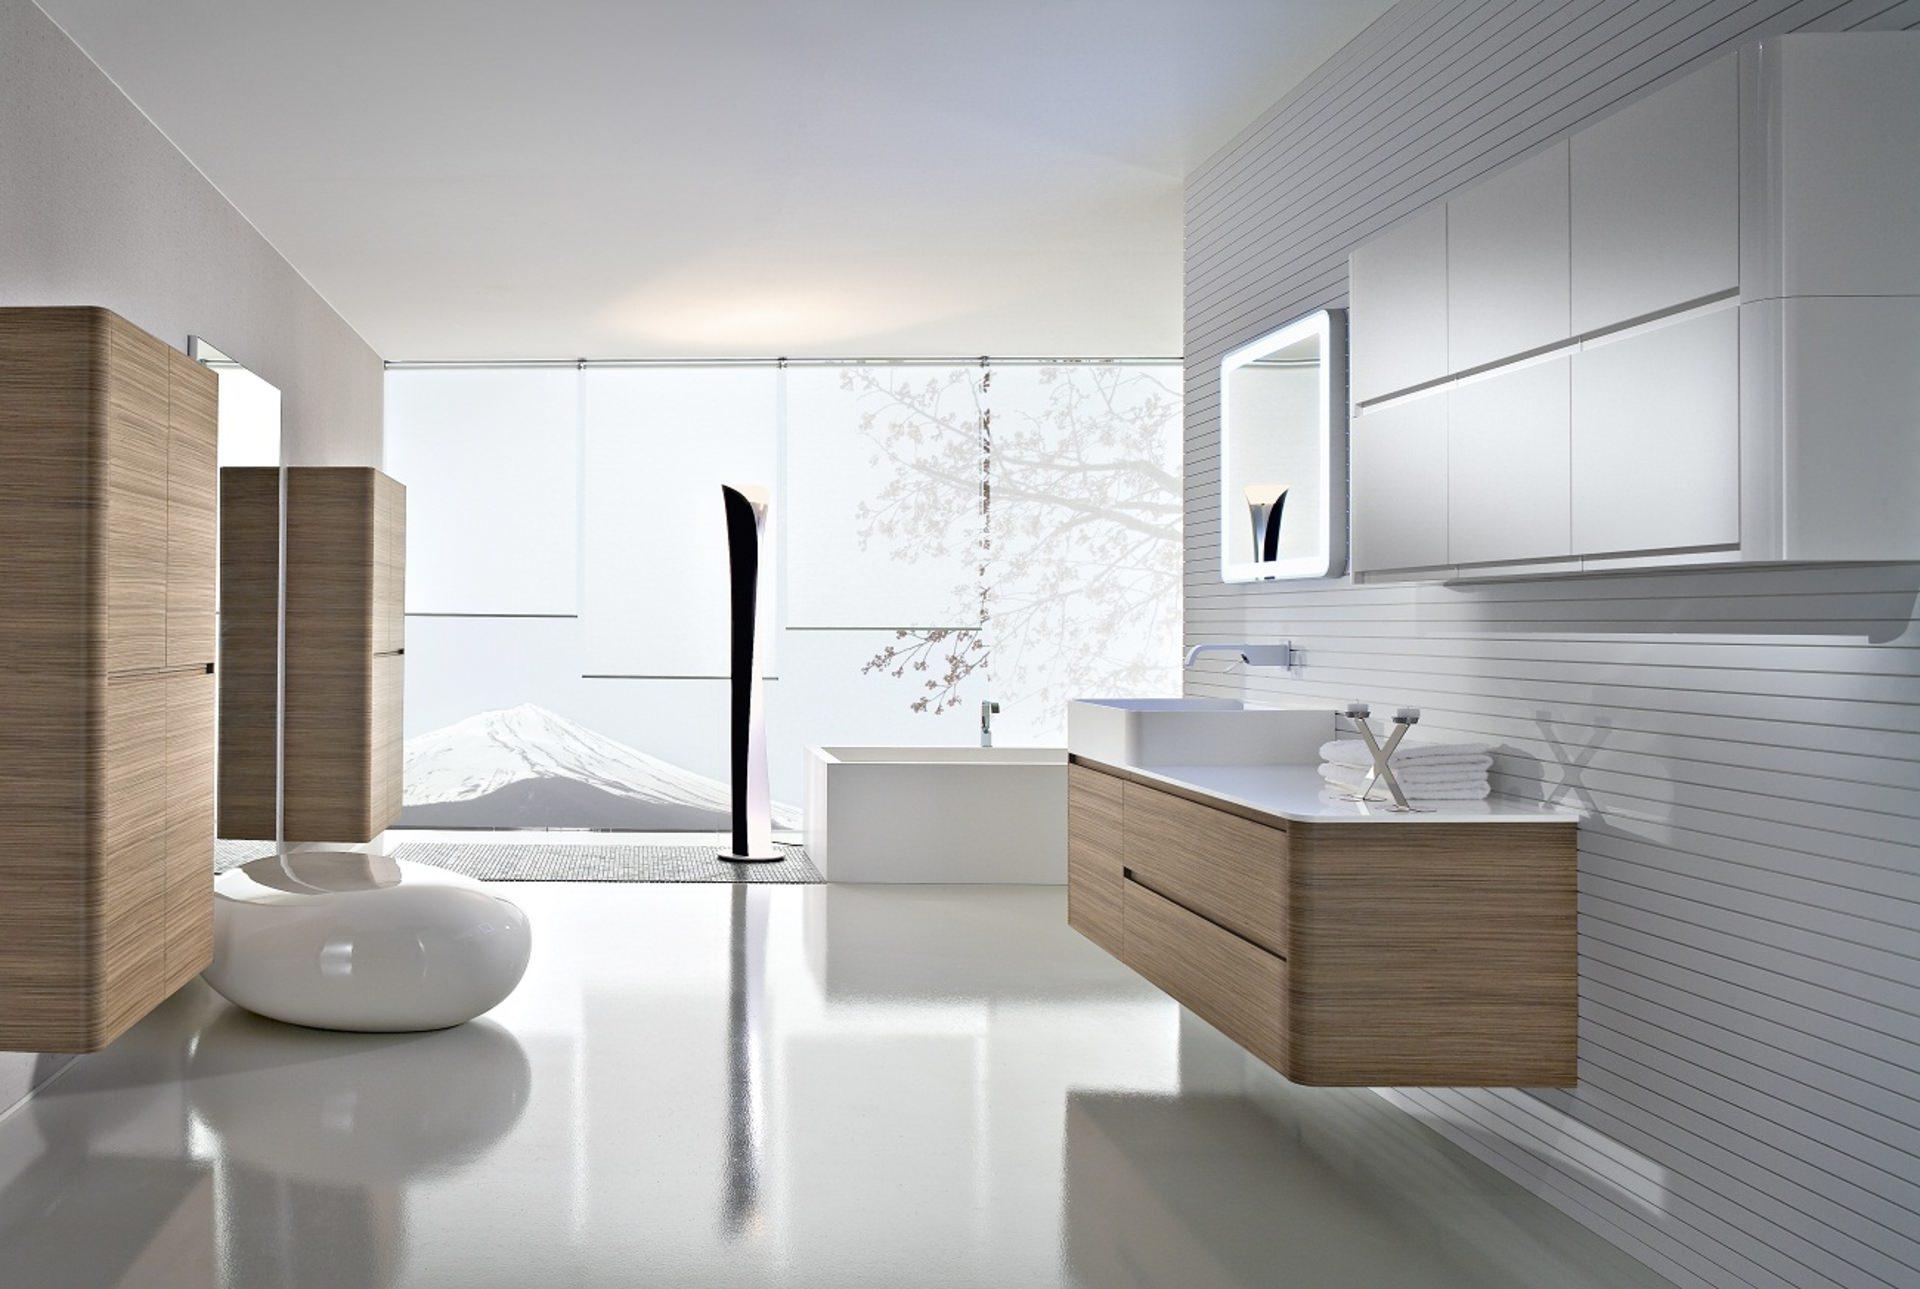 Bathroom Remodeling Marietta Ga custom design kitchen and bathroom remodeling marietta ga